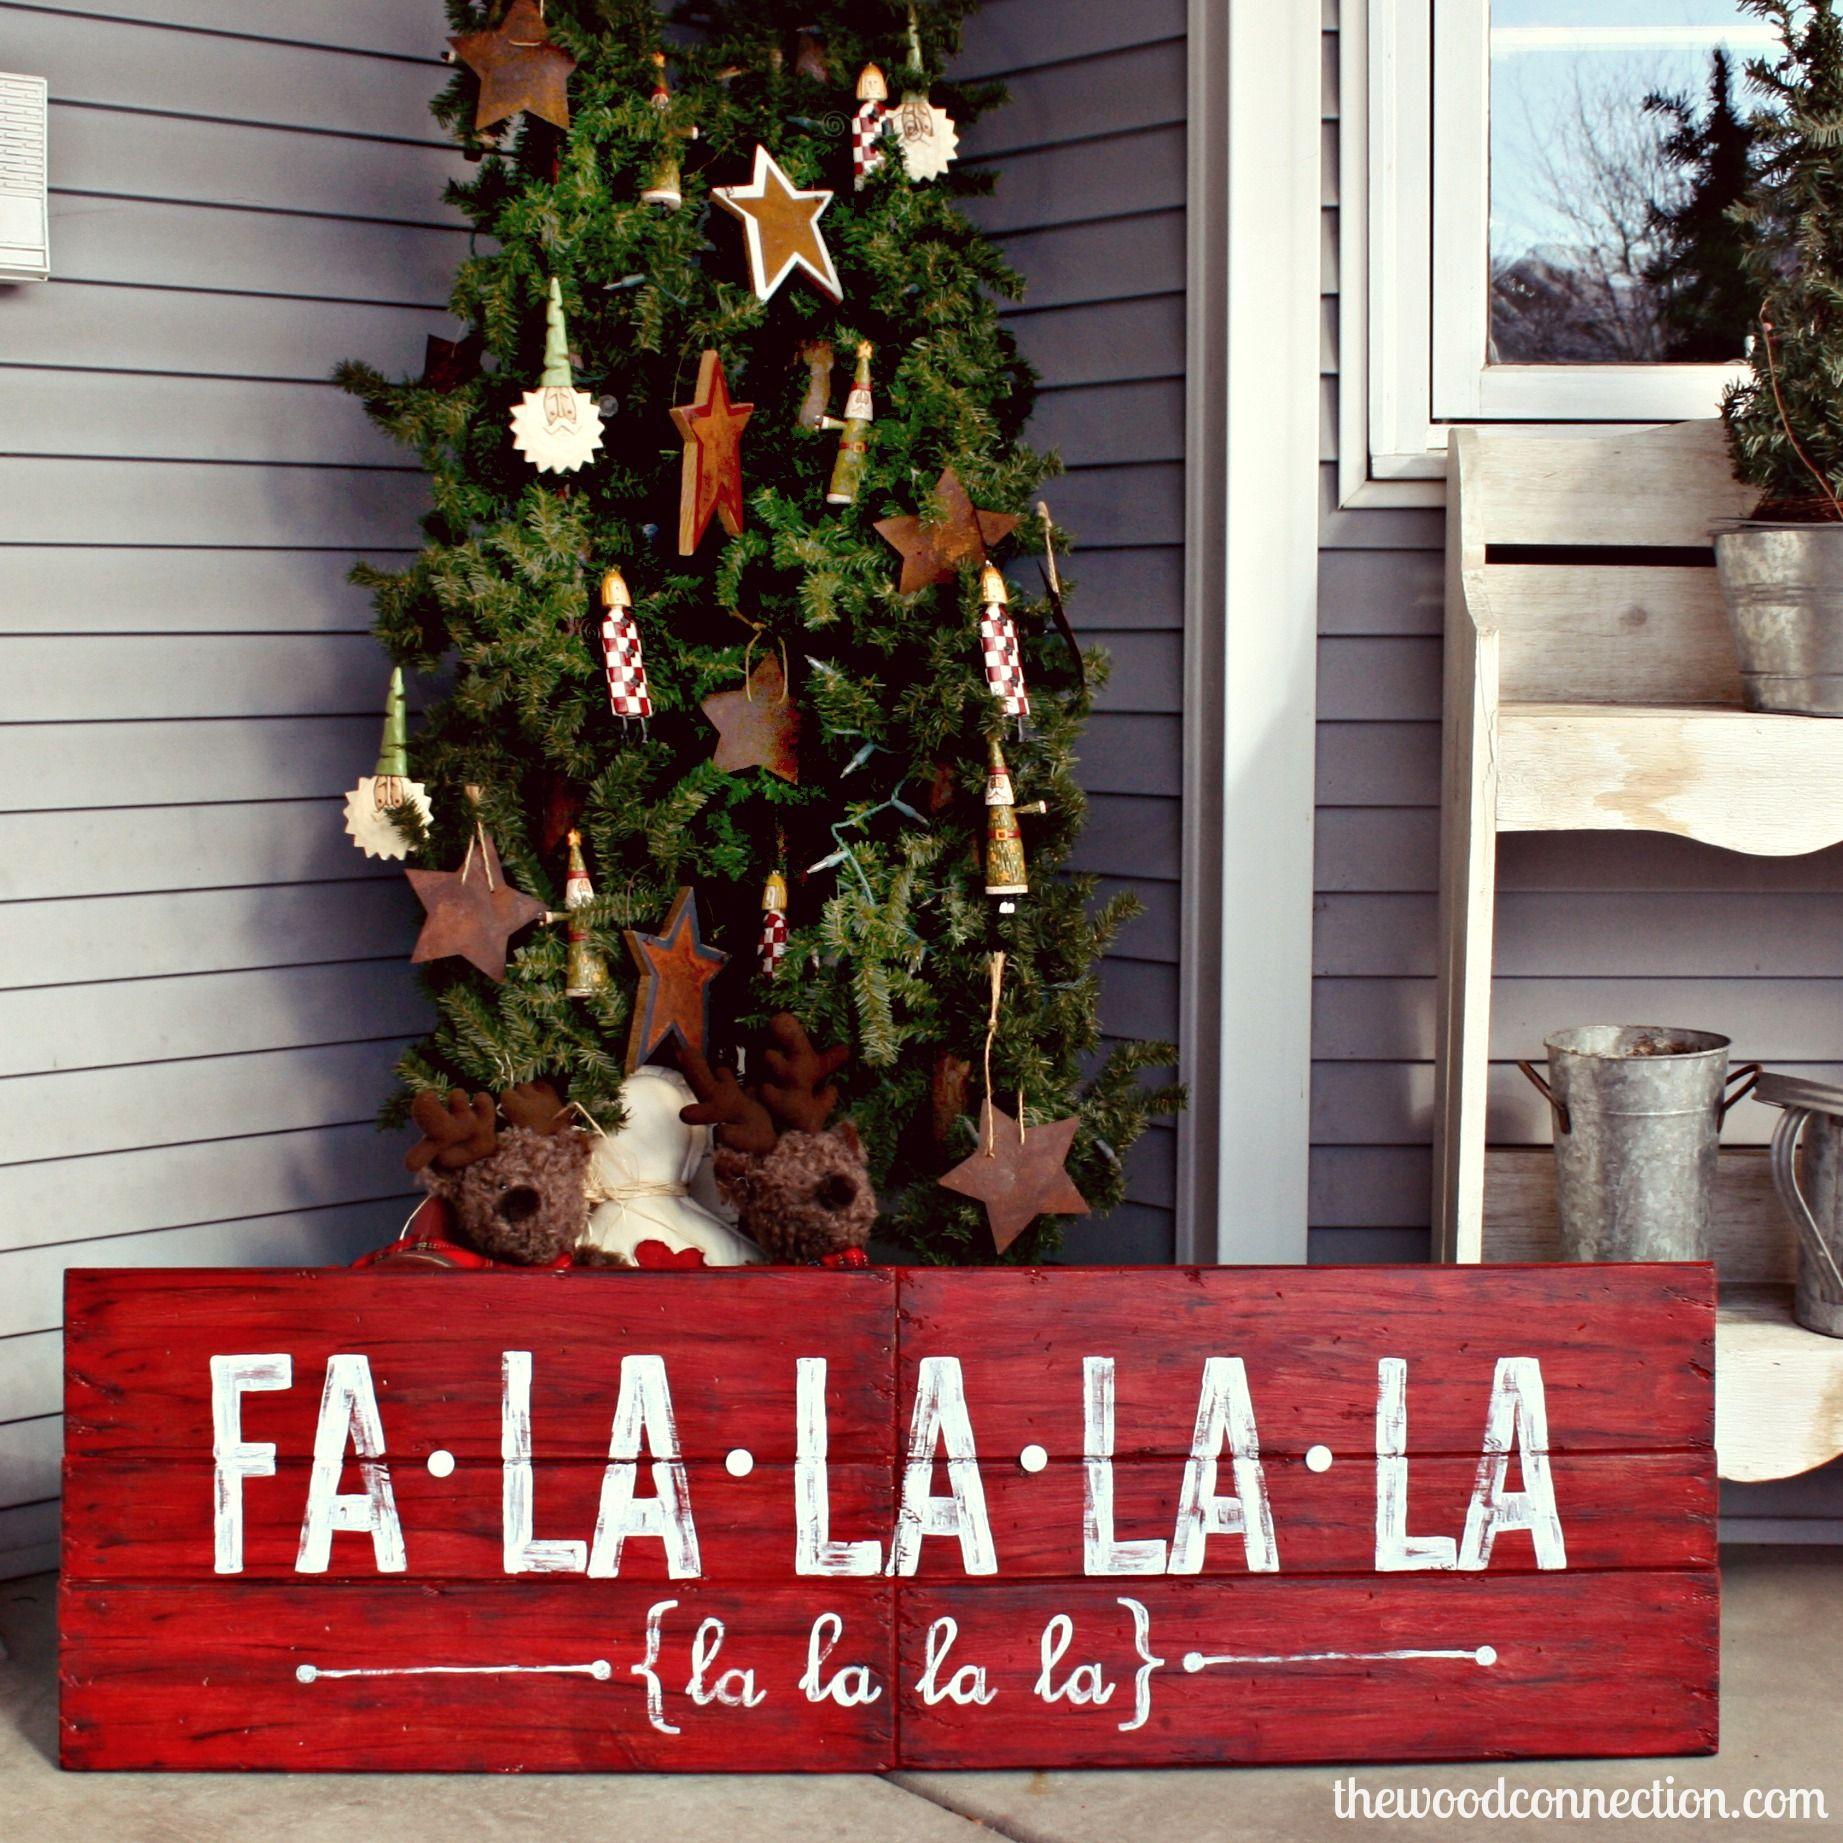 ❄ Fa La La La La Vintage Christmas Sign ~ #ChristmasCountdown #69sleeps #BBM #Channel ಌஜChristmas(*) C003C6E4Cٓ ஜಌ